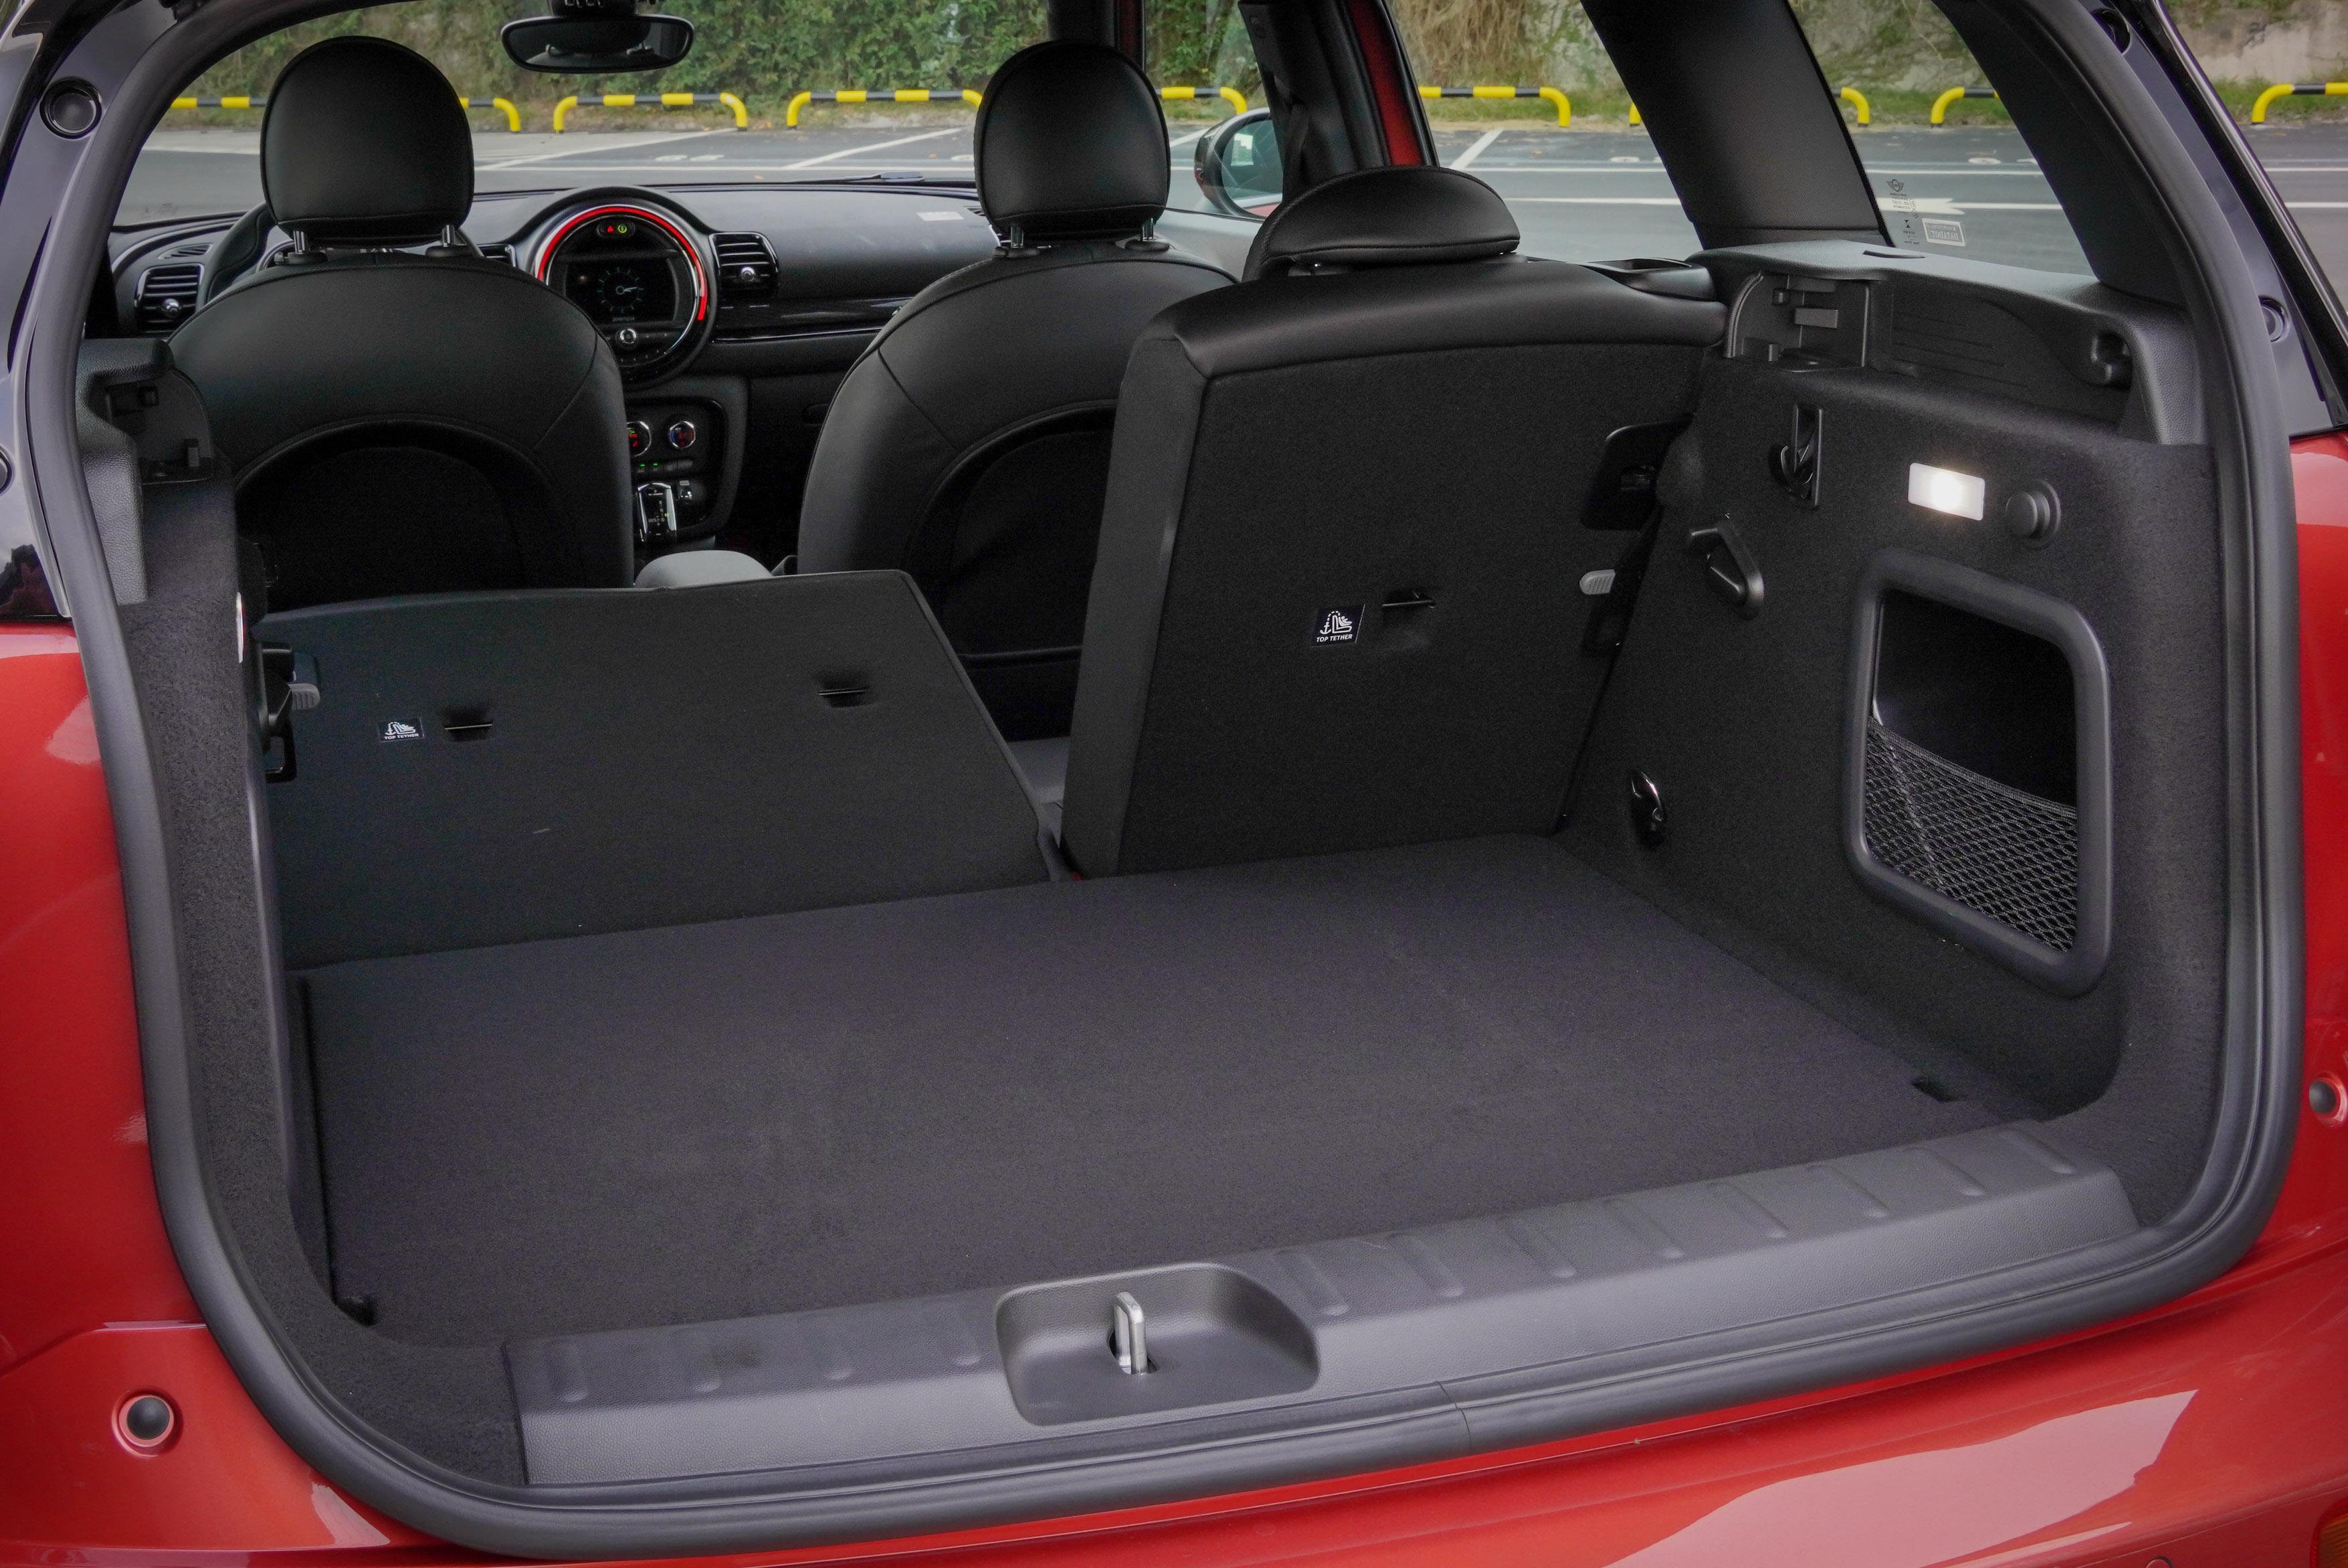 Clubman 後座椅背提供 6/4 傾倒功能,擁有 360-1250 公升行李廂空間。